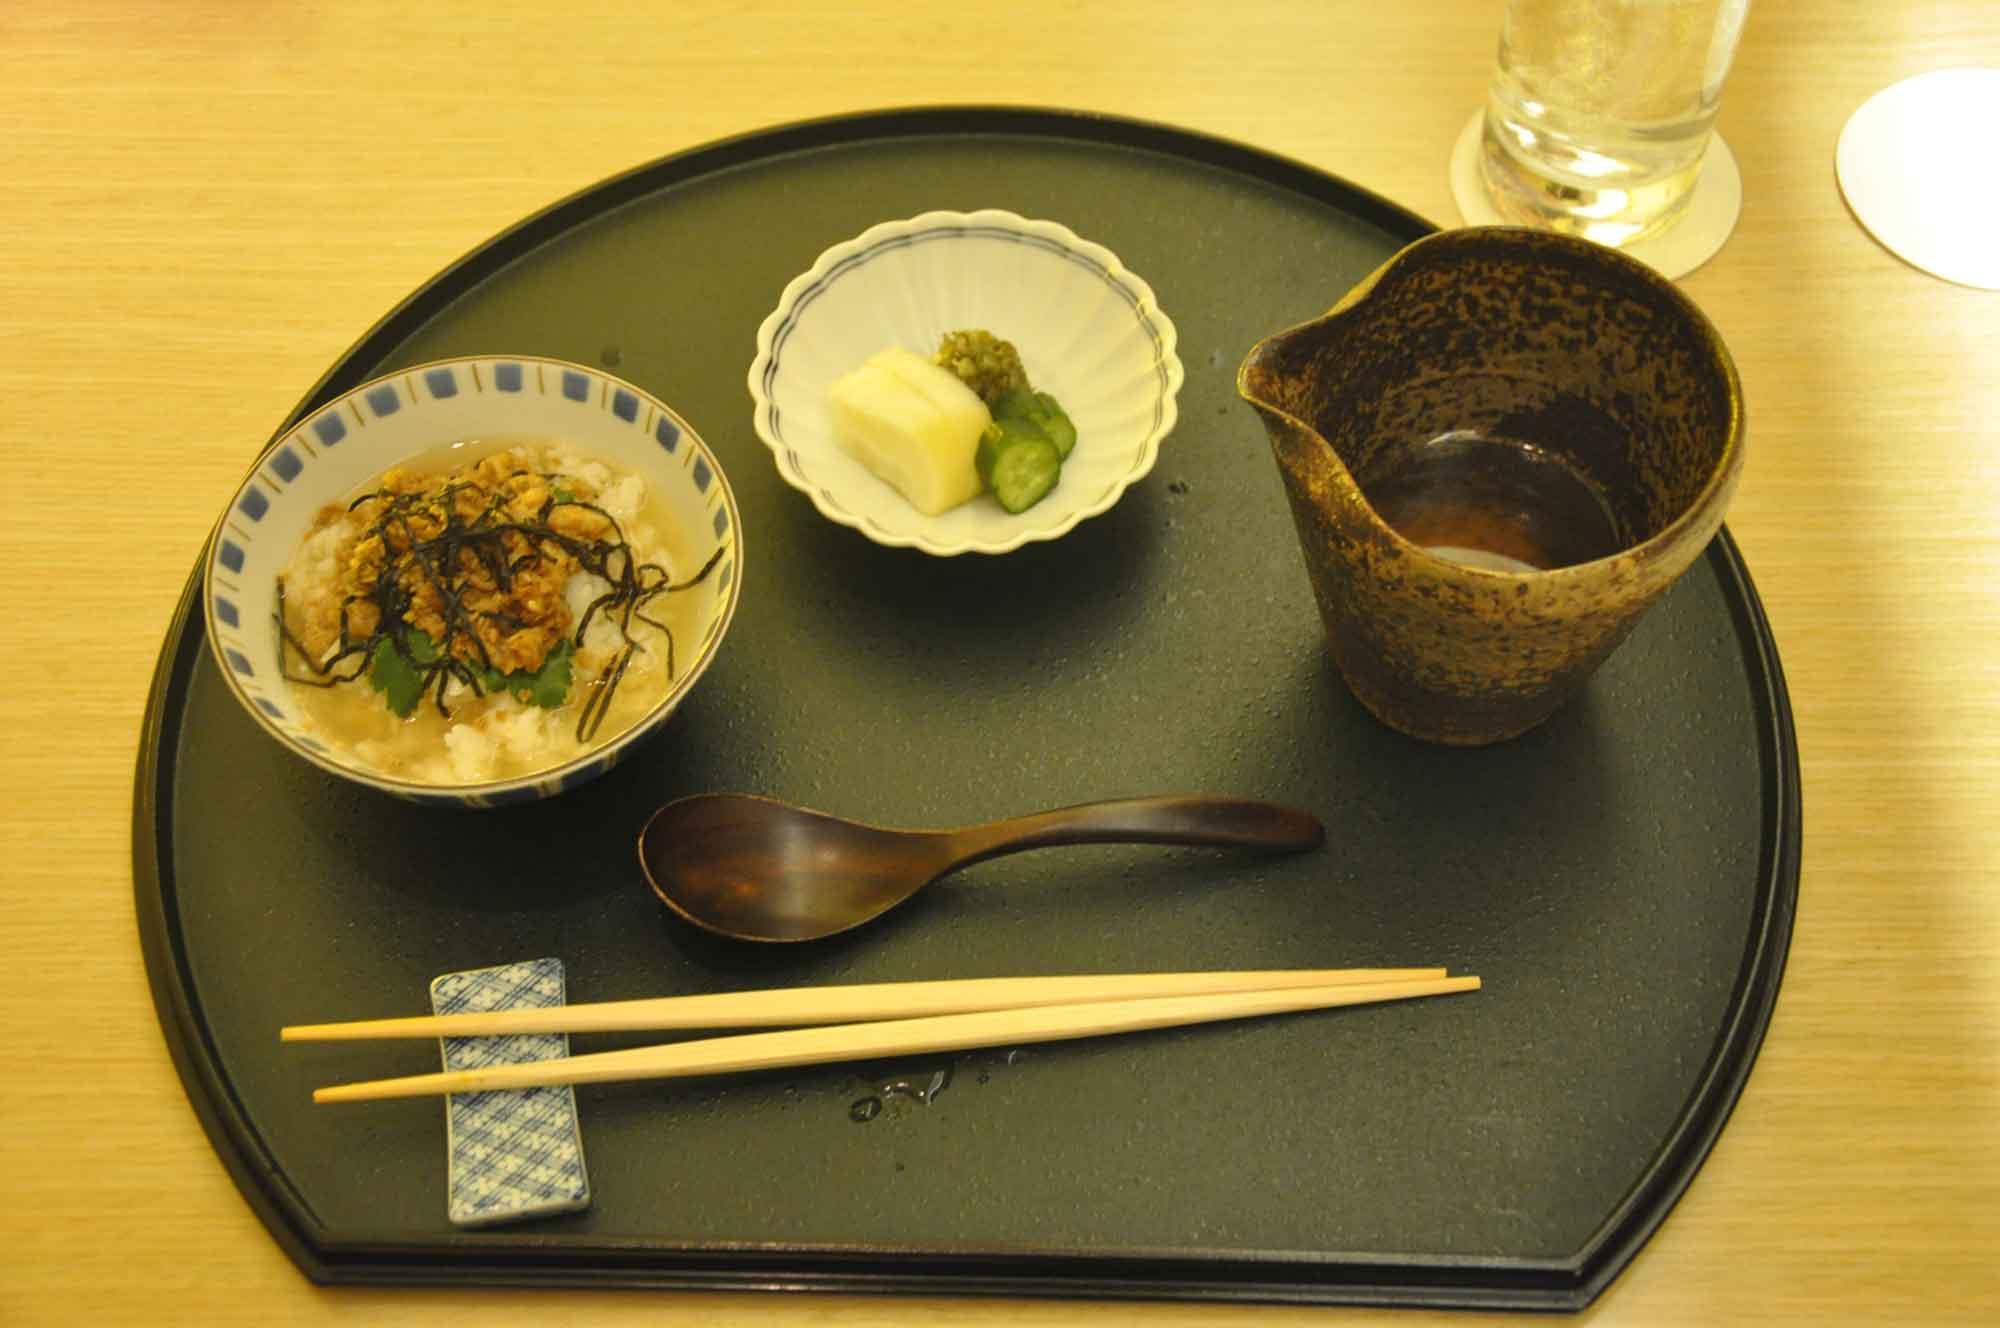 Yamazato Macau Steamed Rice with Sea Bream